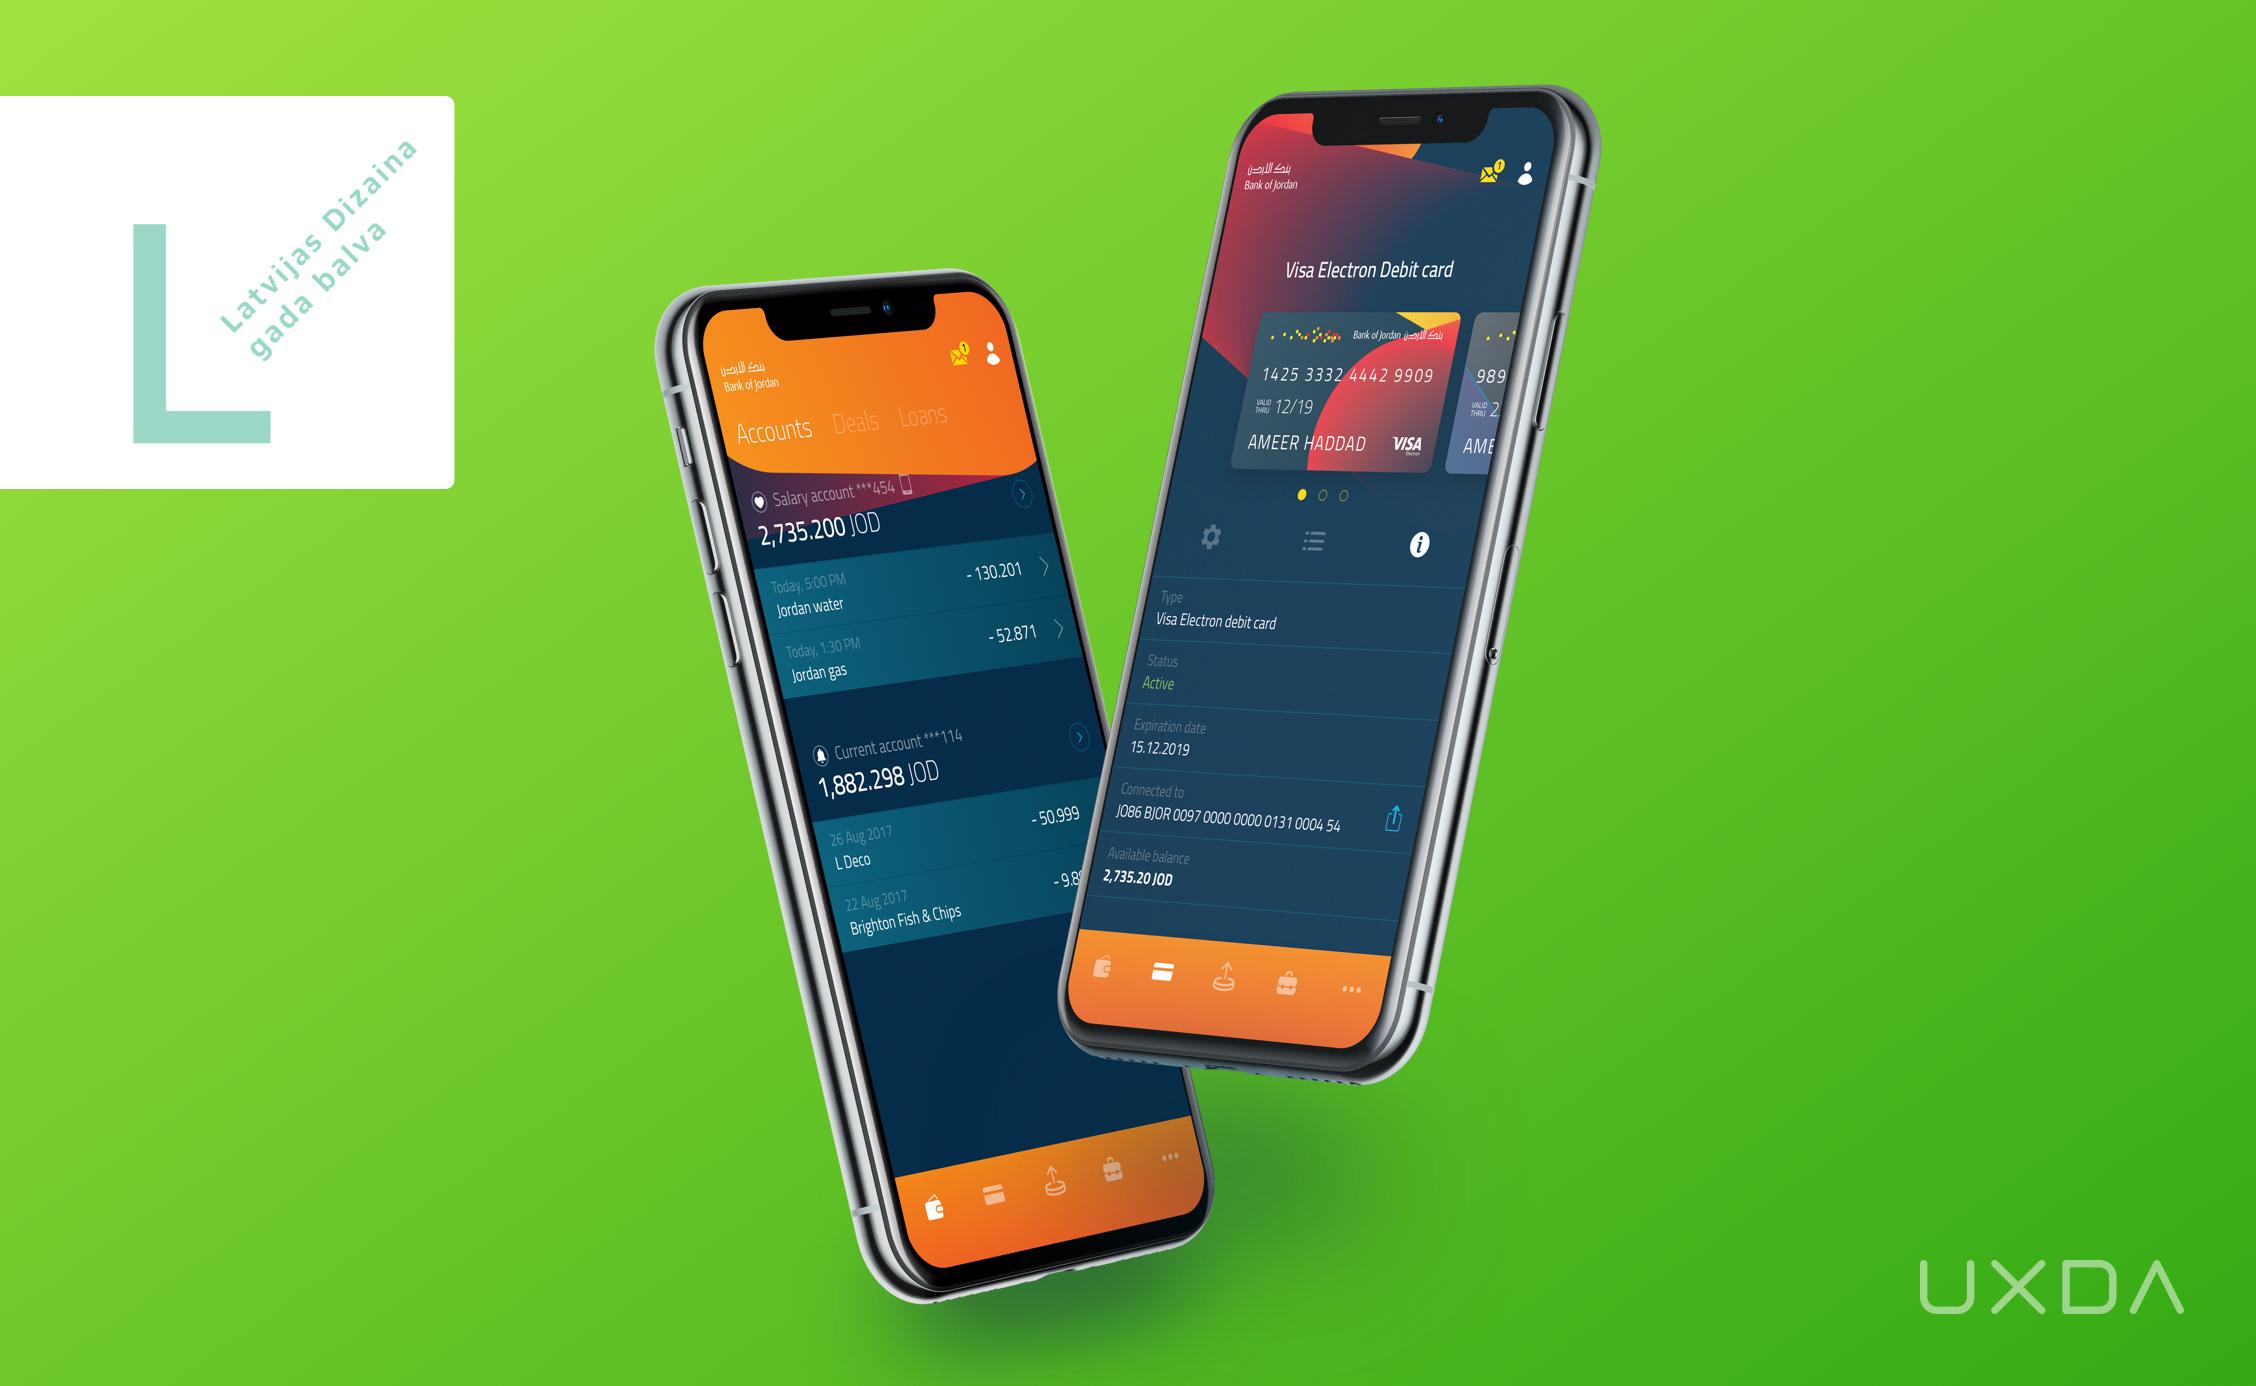 mobile-banking-ux-case-study-uxda-15.jpg